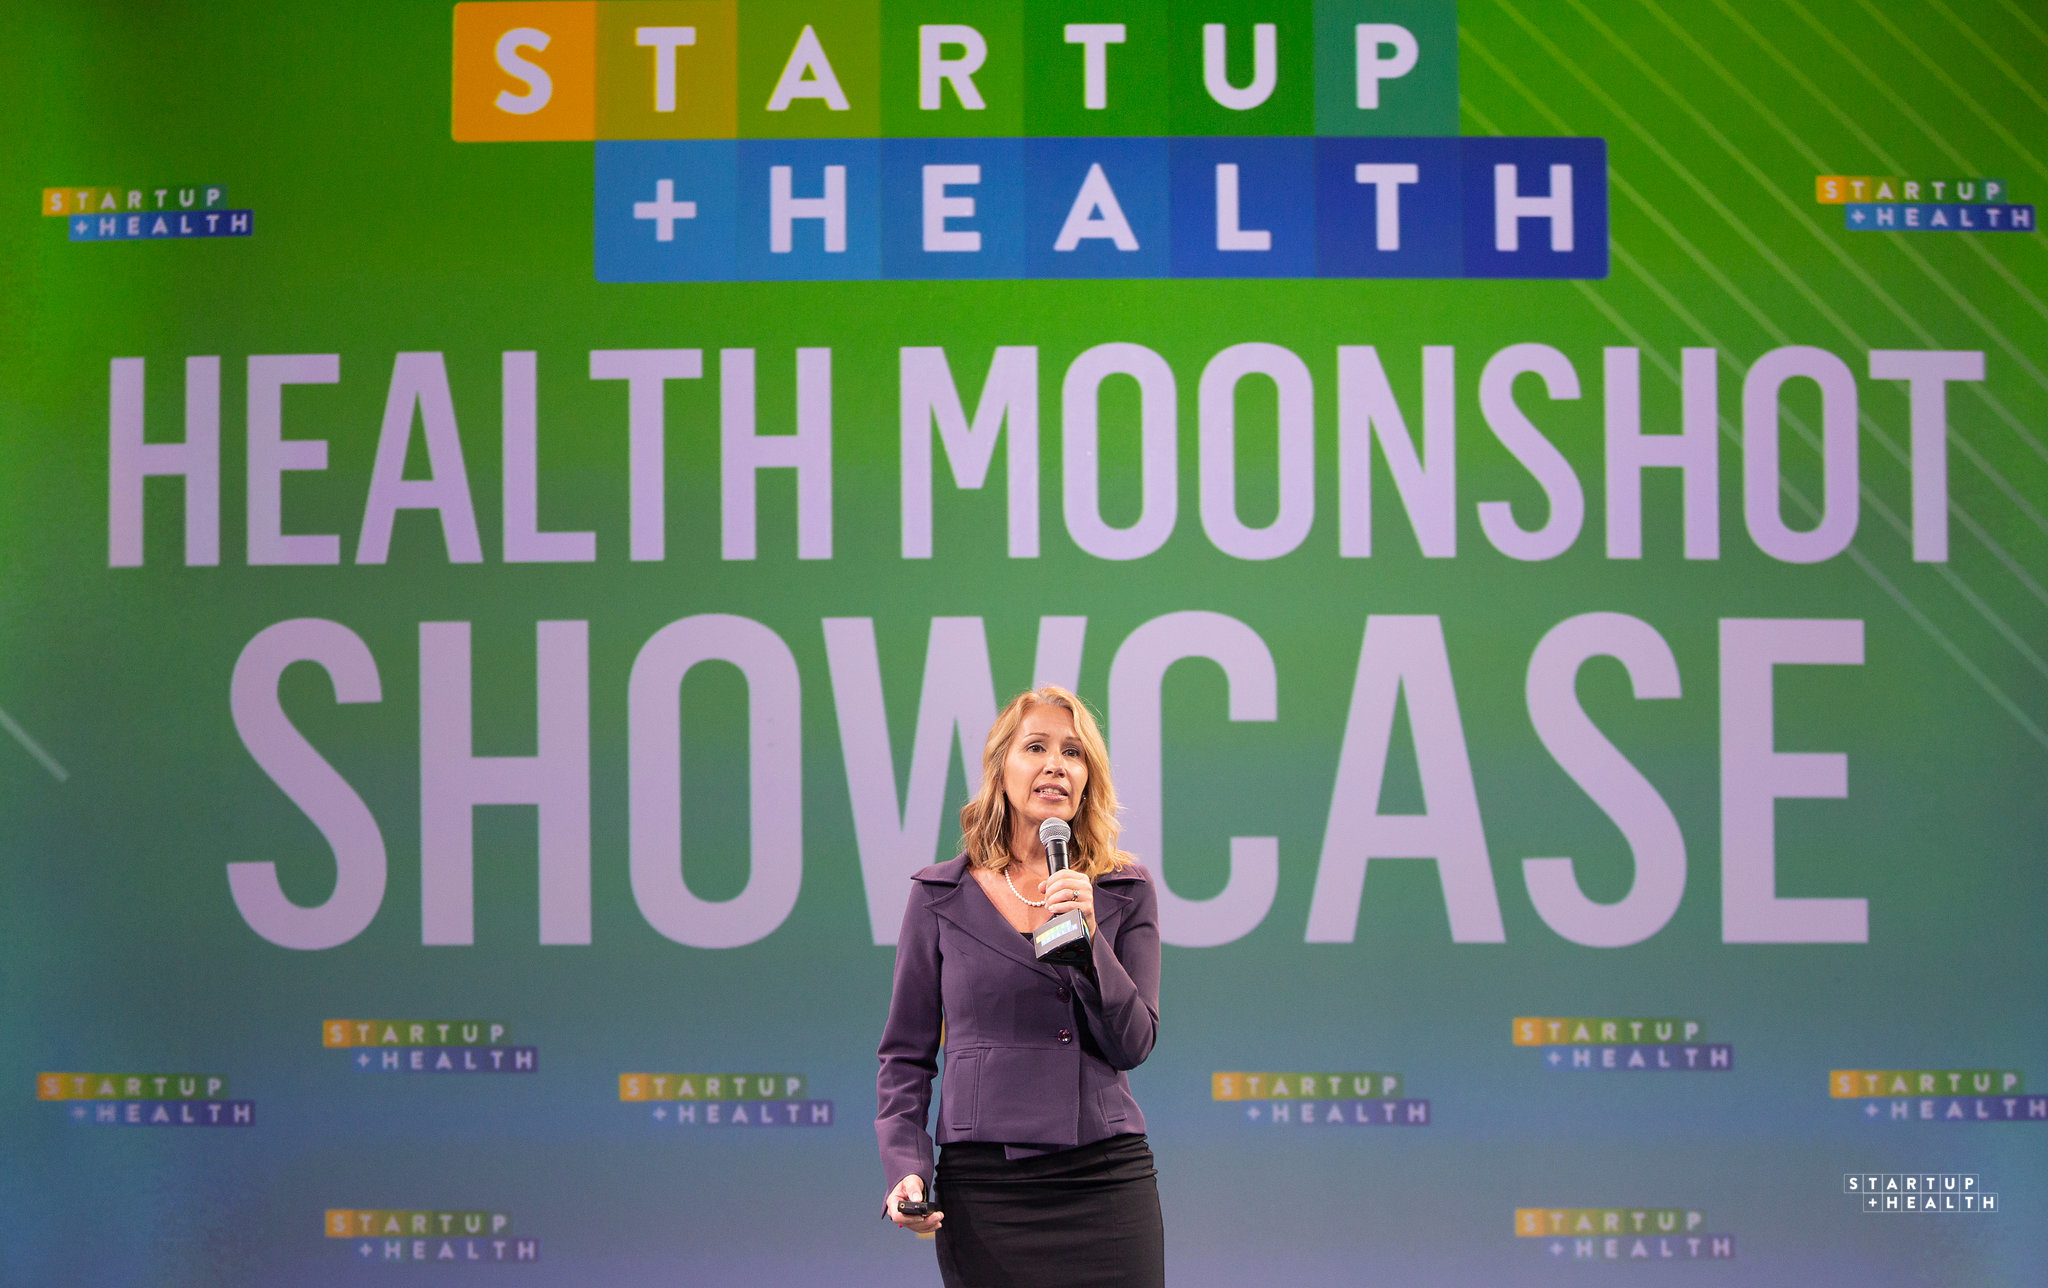 Curatio CEO Lynda Brown-Ganzert presenting at the 2019 StartUp Health Festival's Health Moonshoot Showcase.